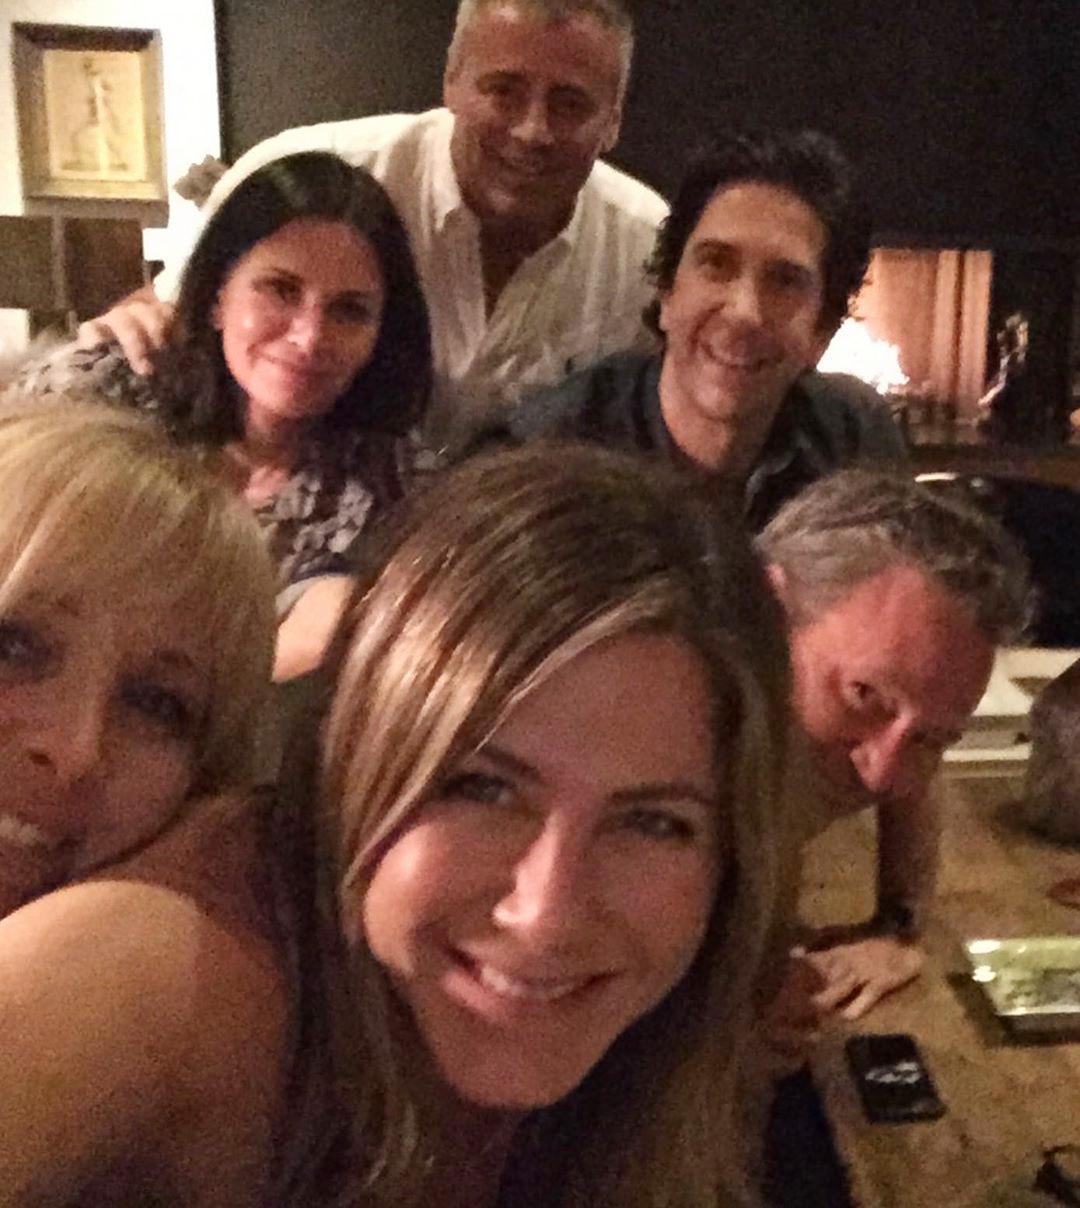 Friends Reunion - Jennifer Aniston Instagram Debut Courteney Cox, Lisa Kudrow, Jennifer Aniston, Matthew Perry, Matt LeBlanc, David Schwimmer